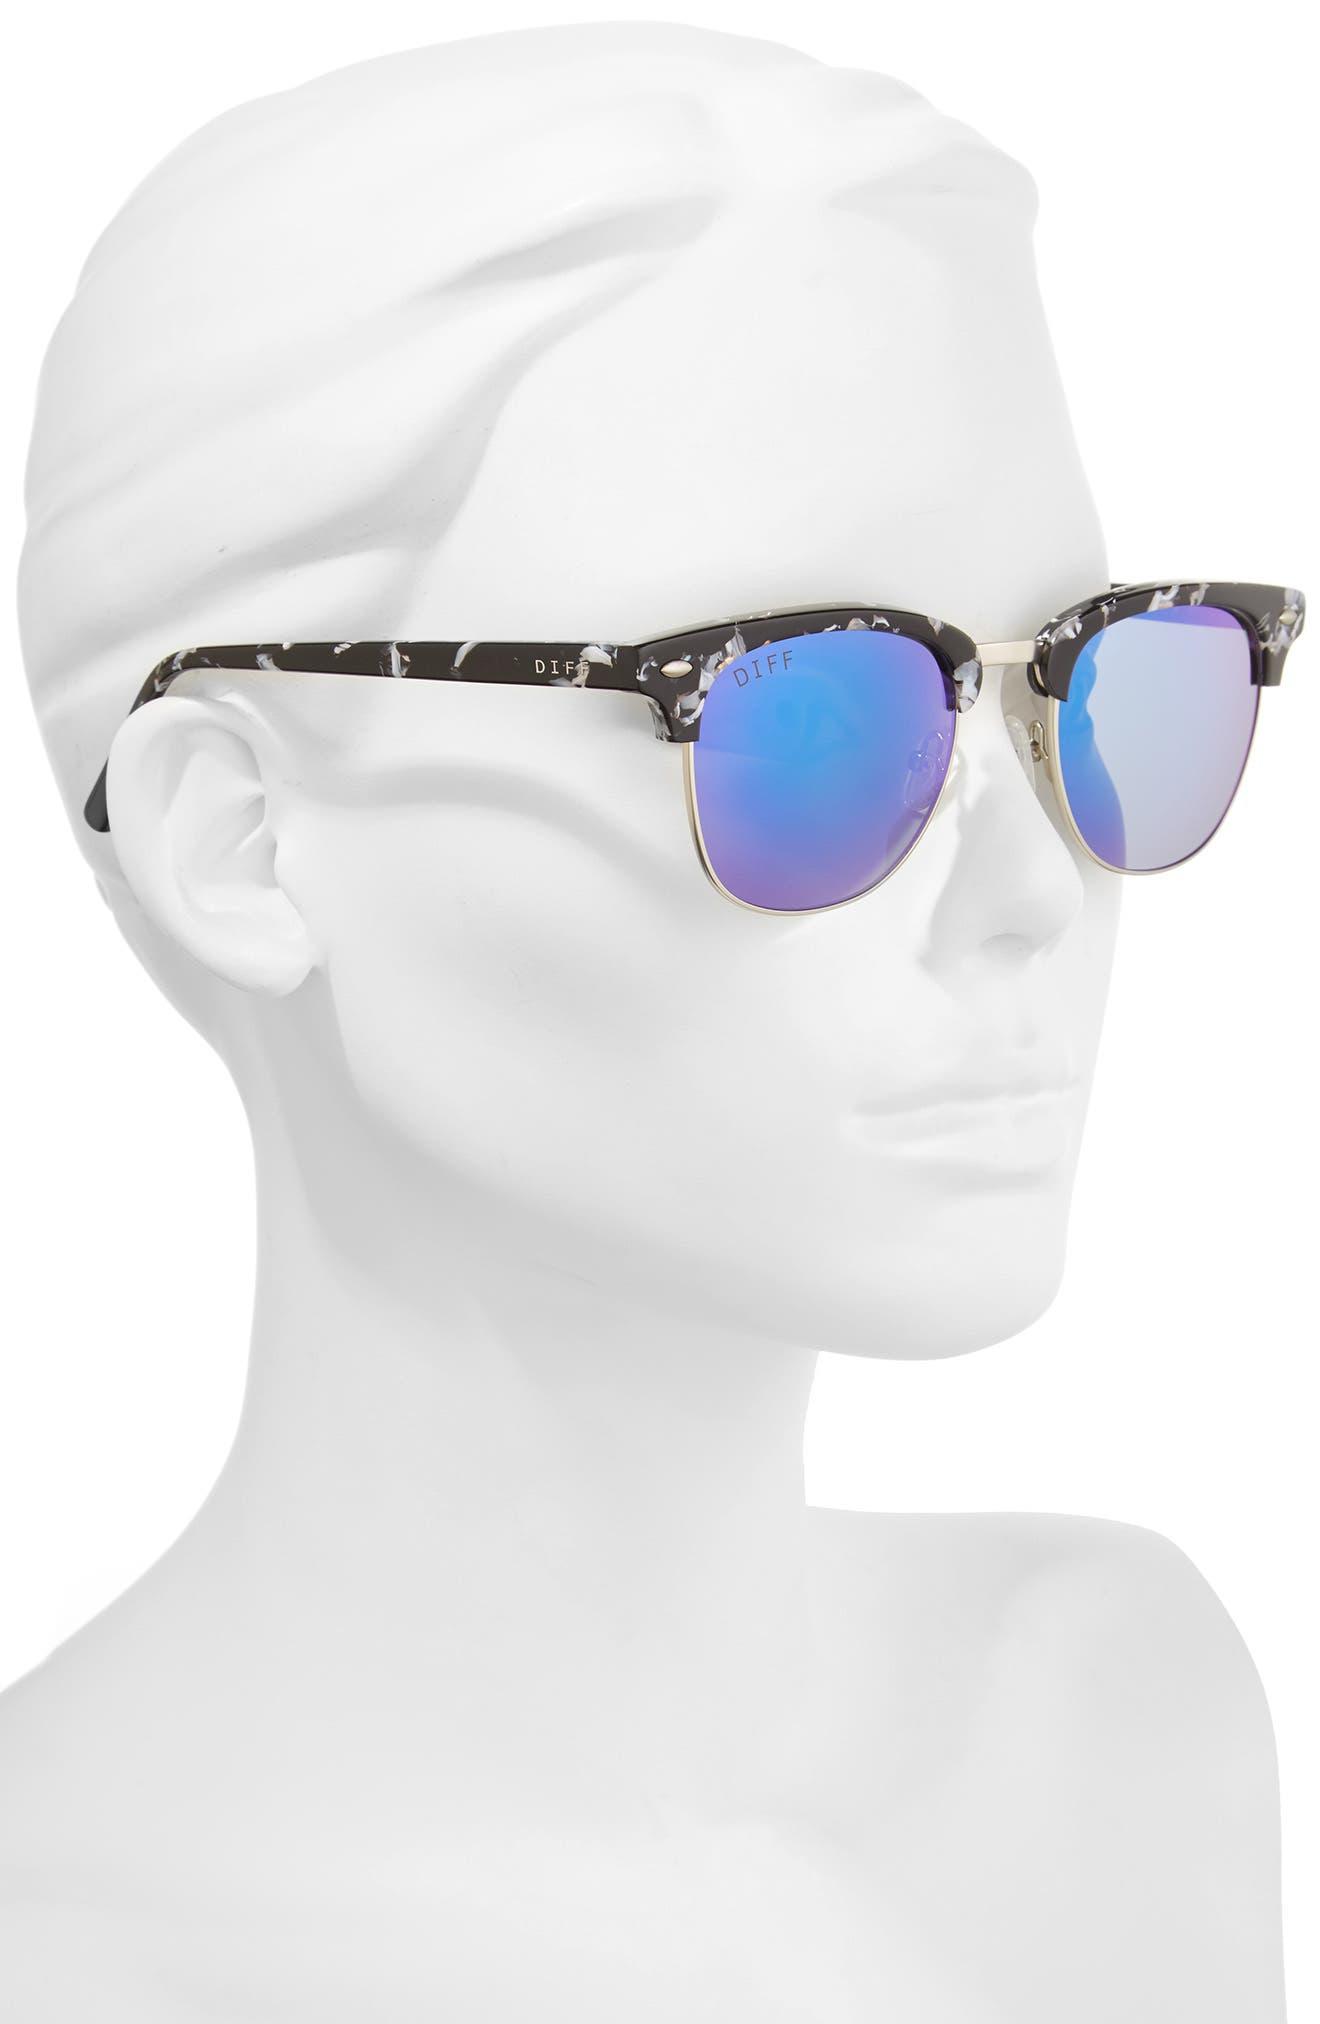 Barry 51mm Polarized Retro Sunglasses,                             Alternate thumbnail 8, color,